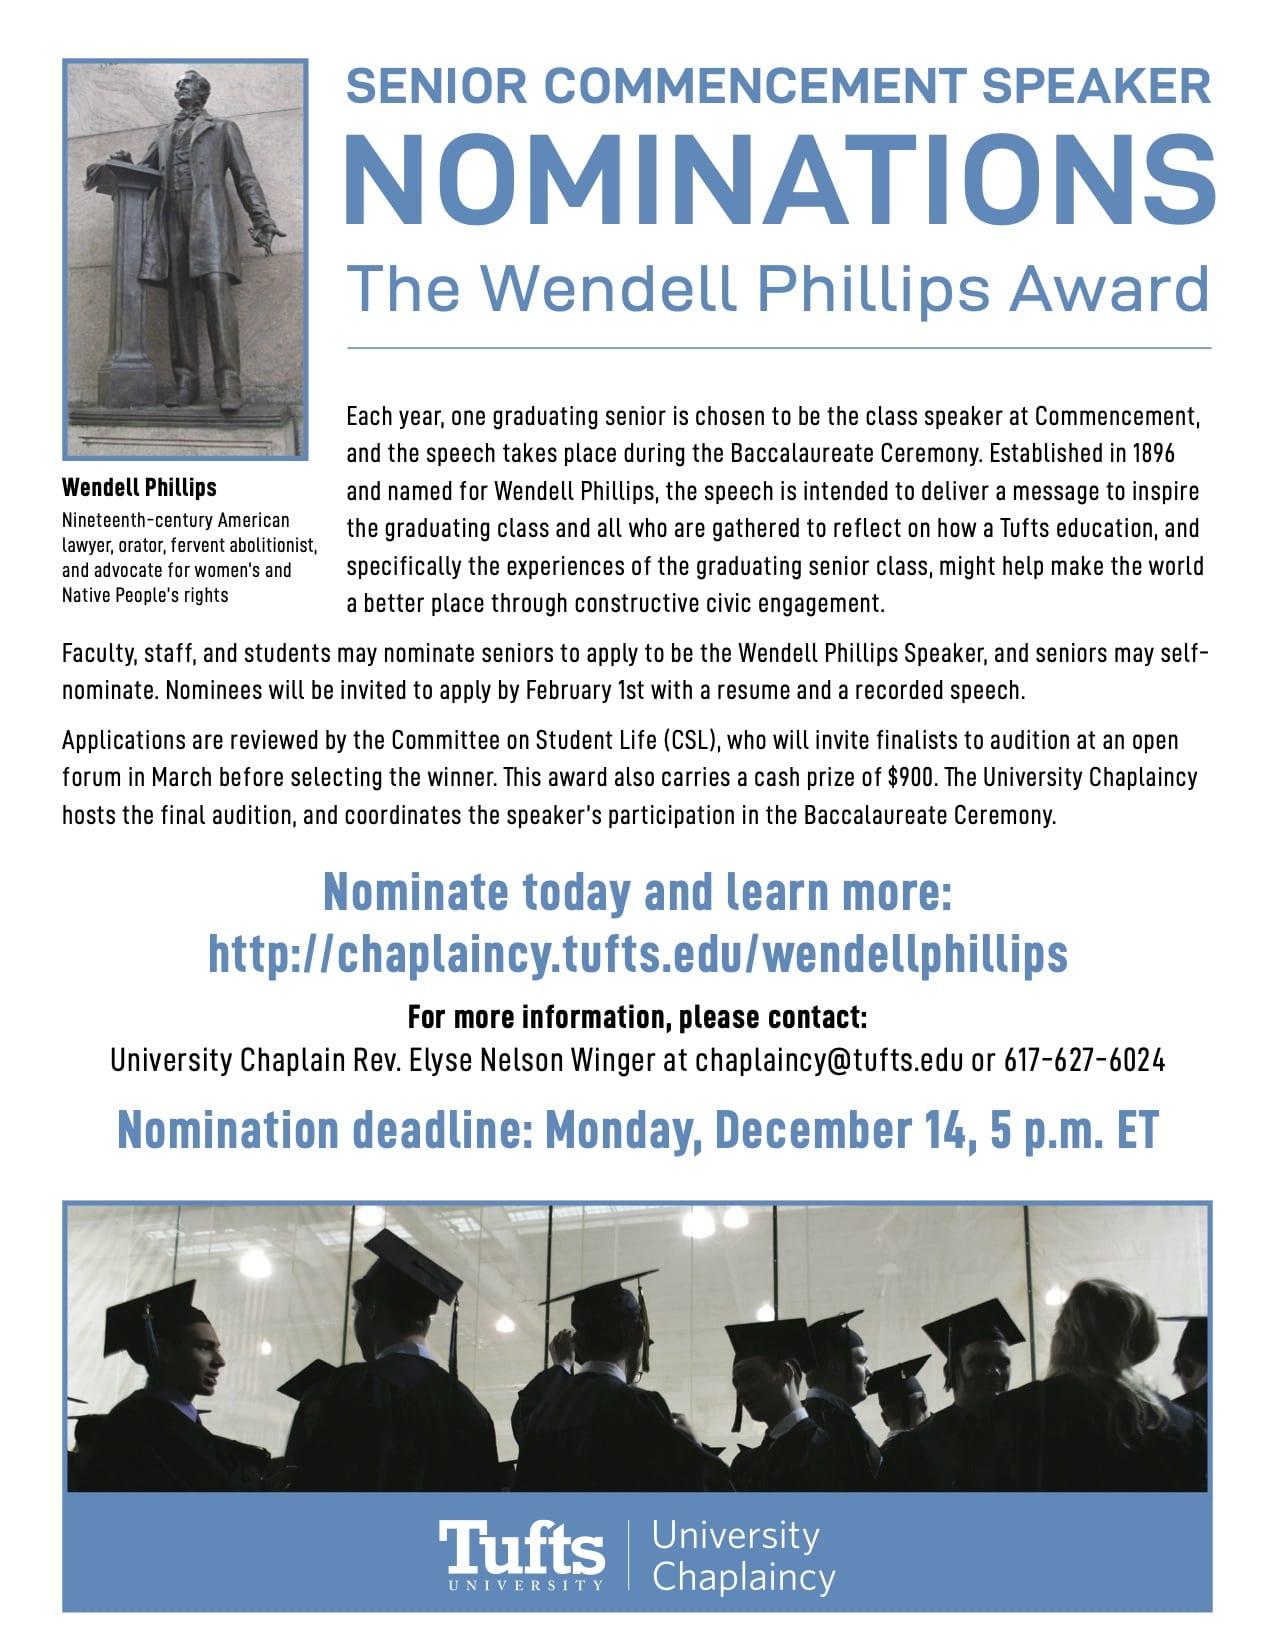 Flyer for Wendell Phillips nomination; all information on website